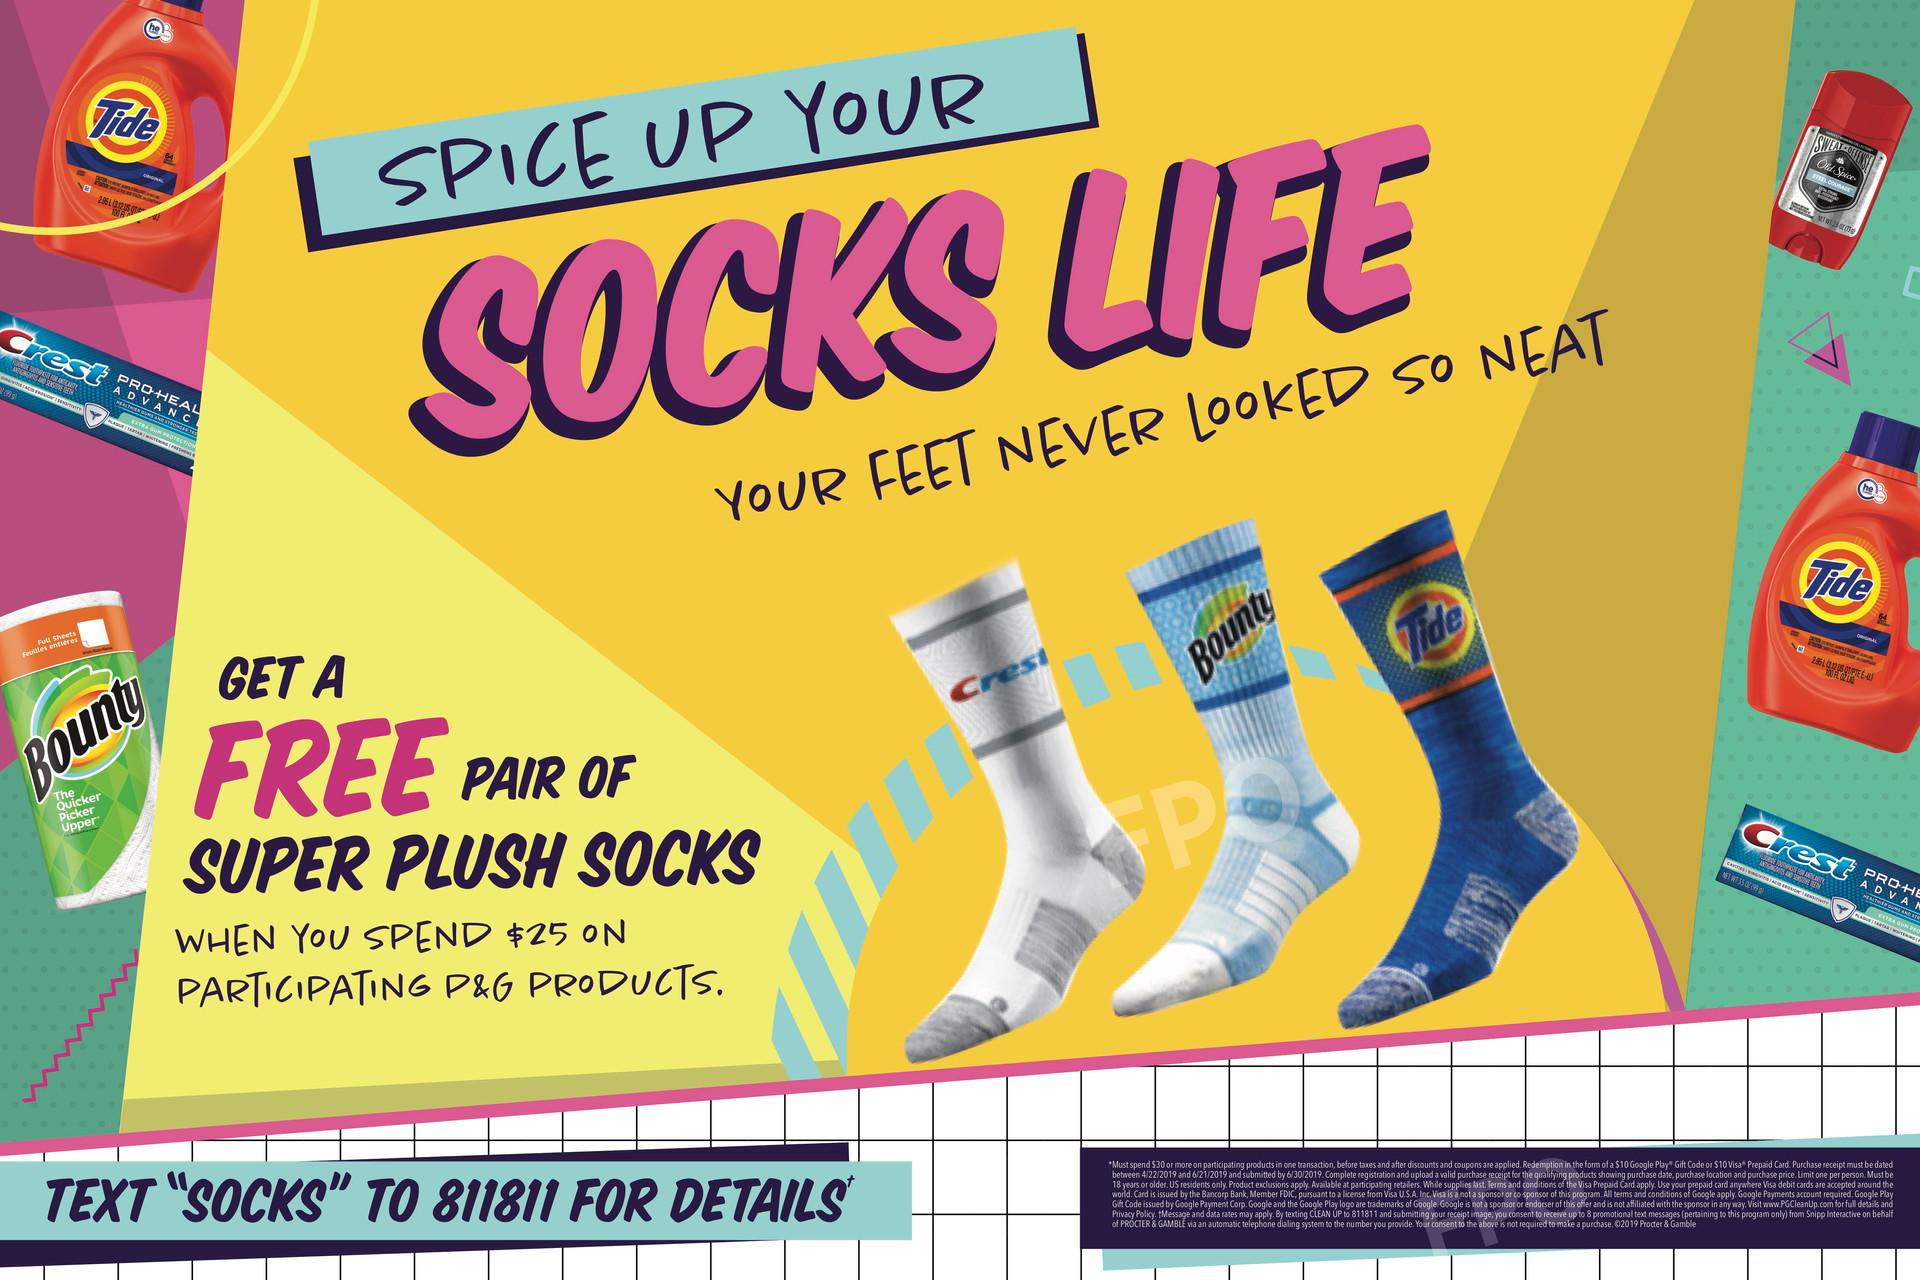 19-386-0001 RS_OND Millennial Socks_V1R0